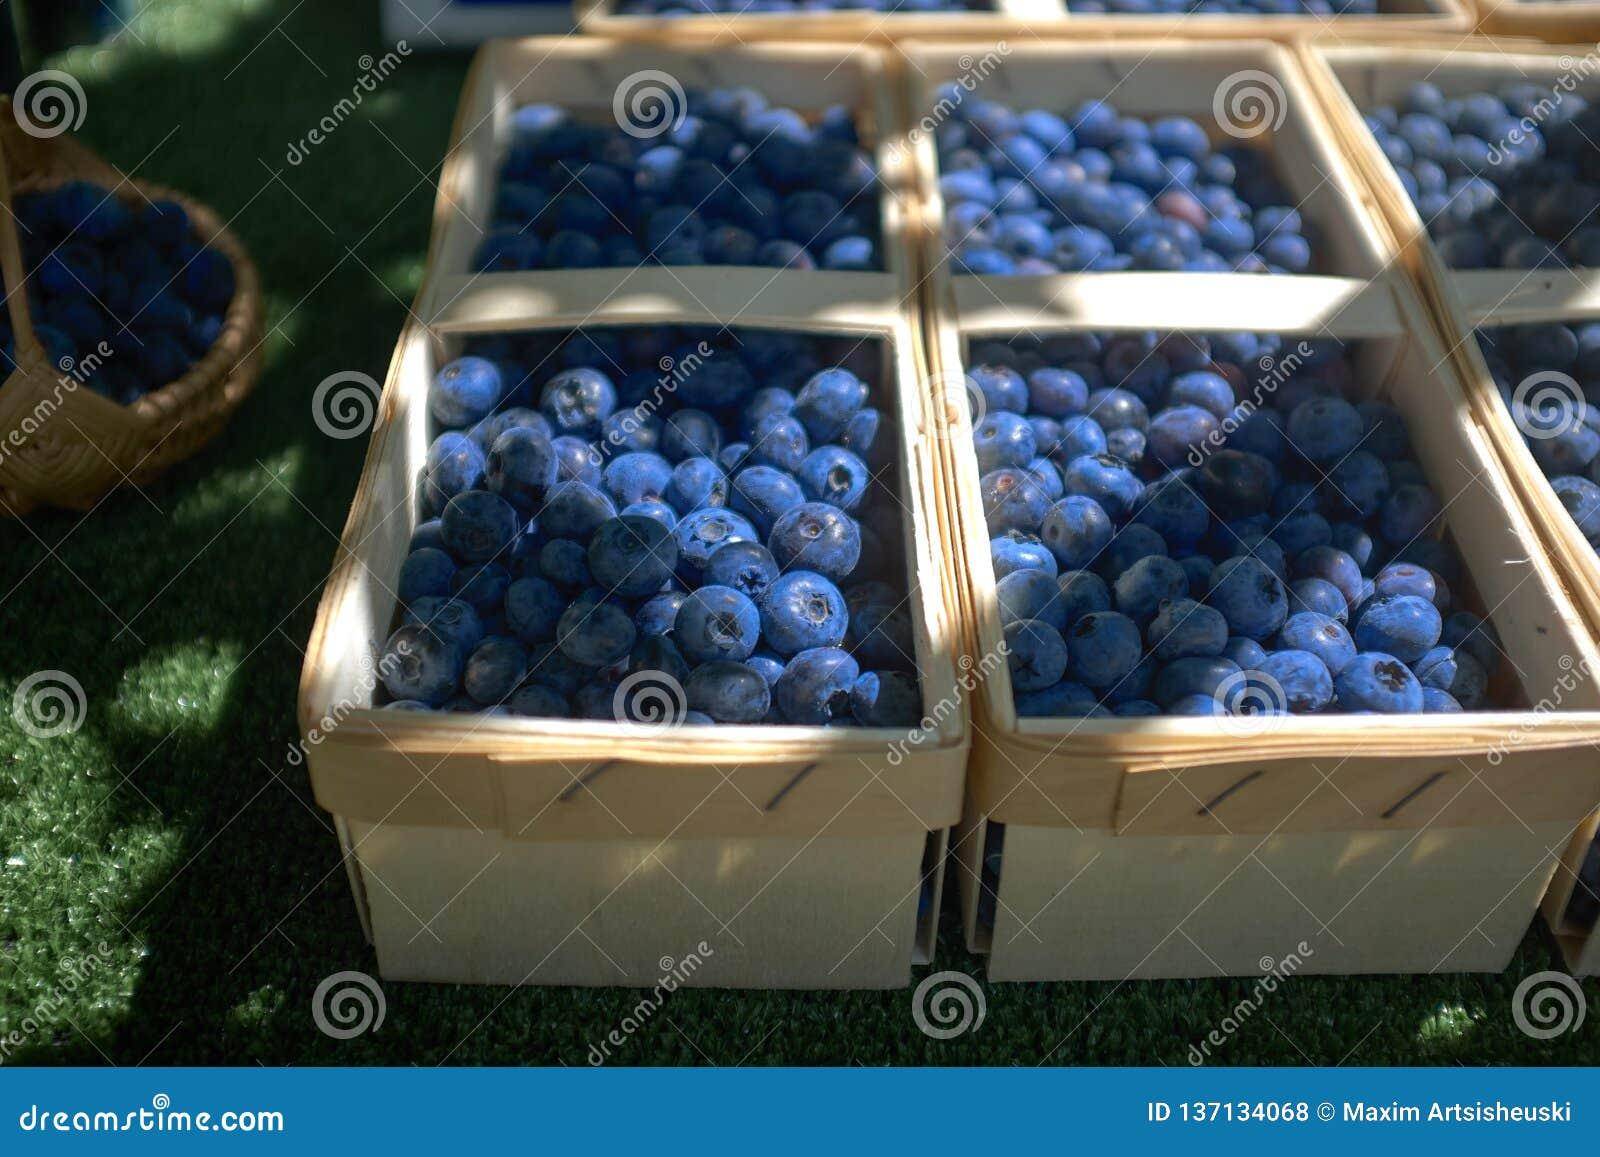 Bayas azules cultivadas en pequeñas cestas en un mercado